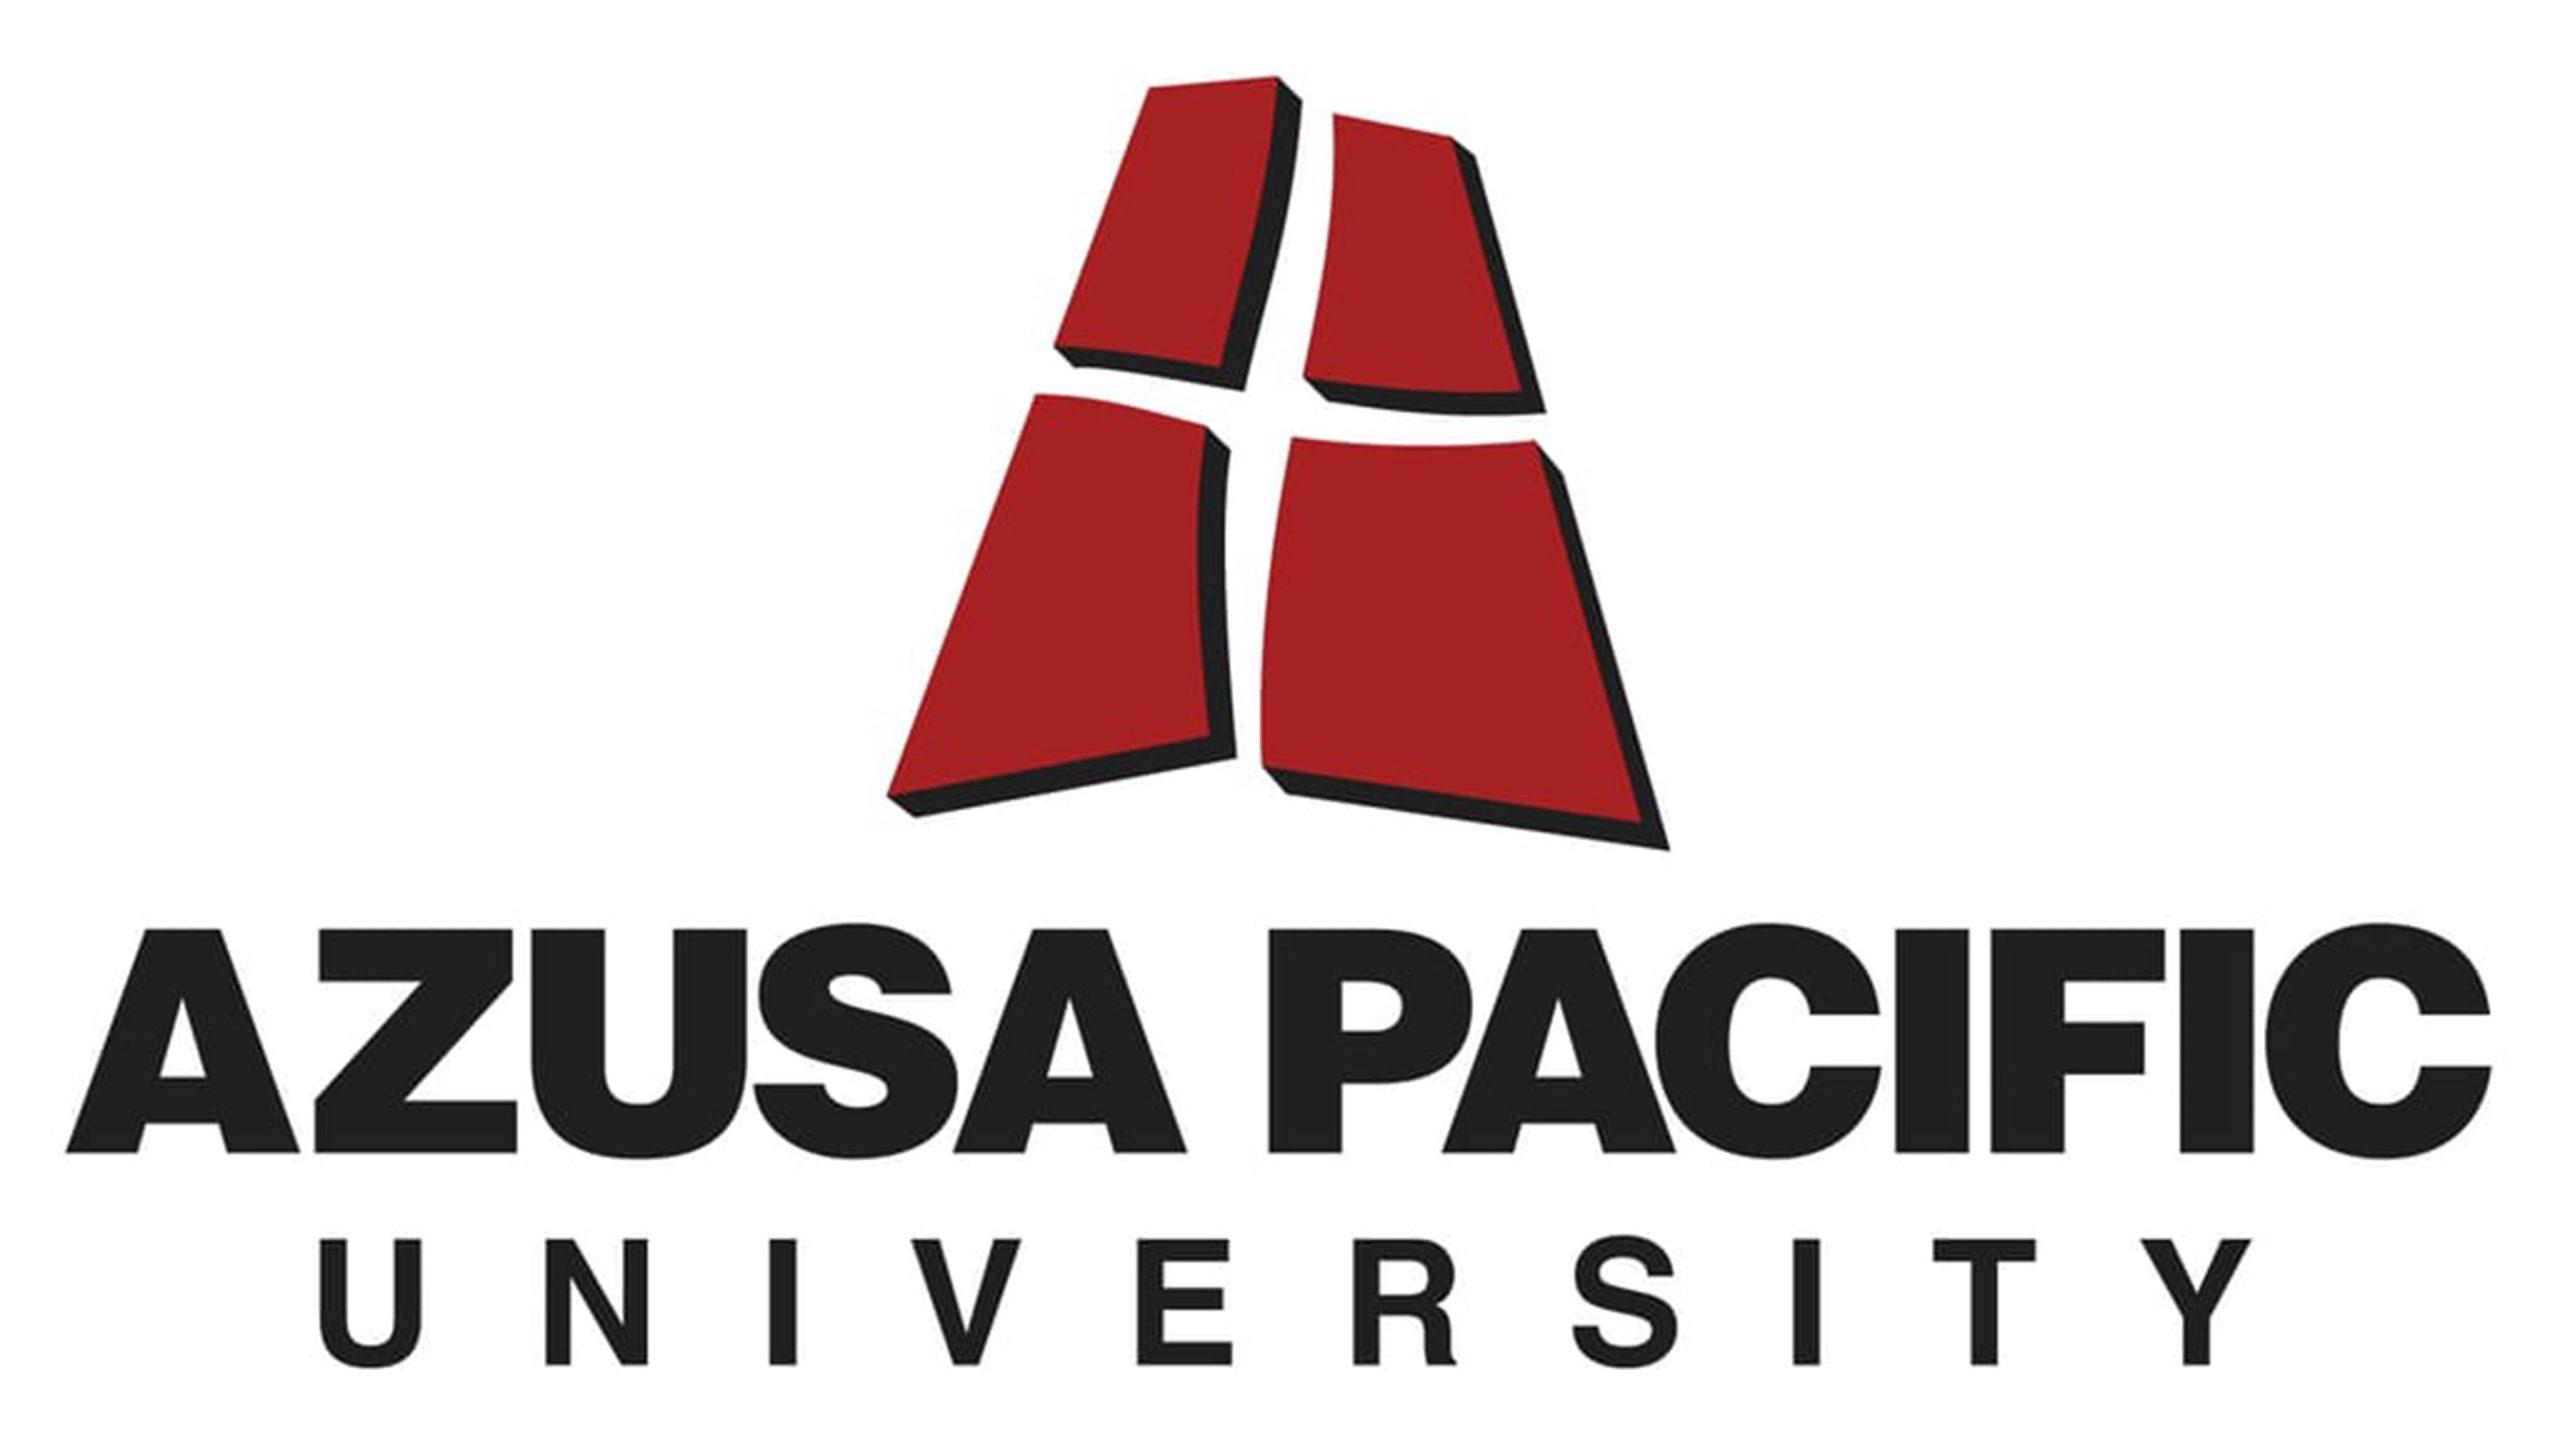 Azuza Pacific University